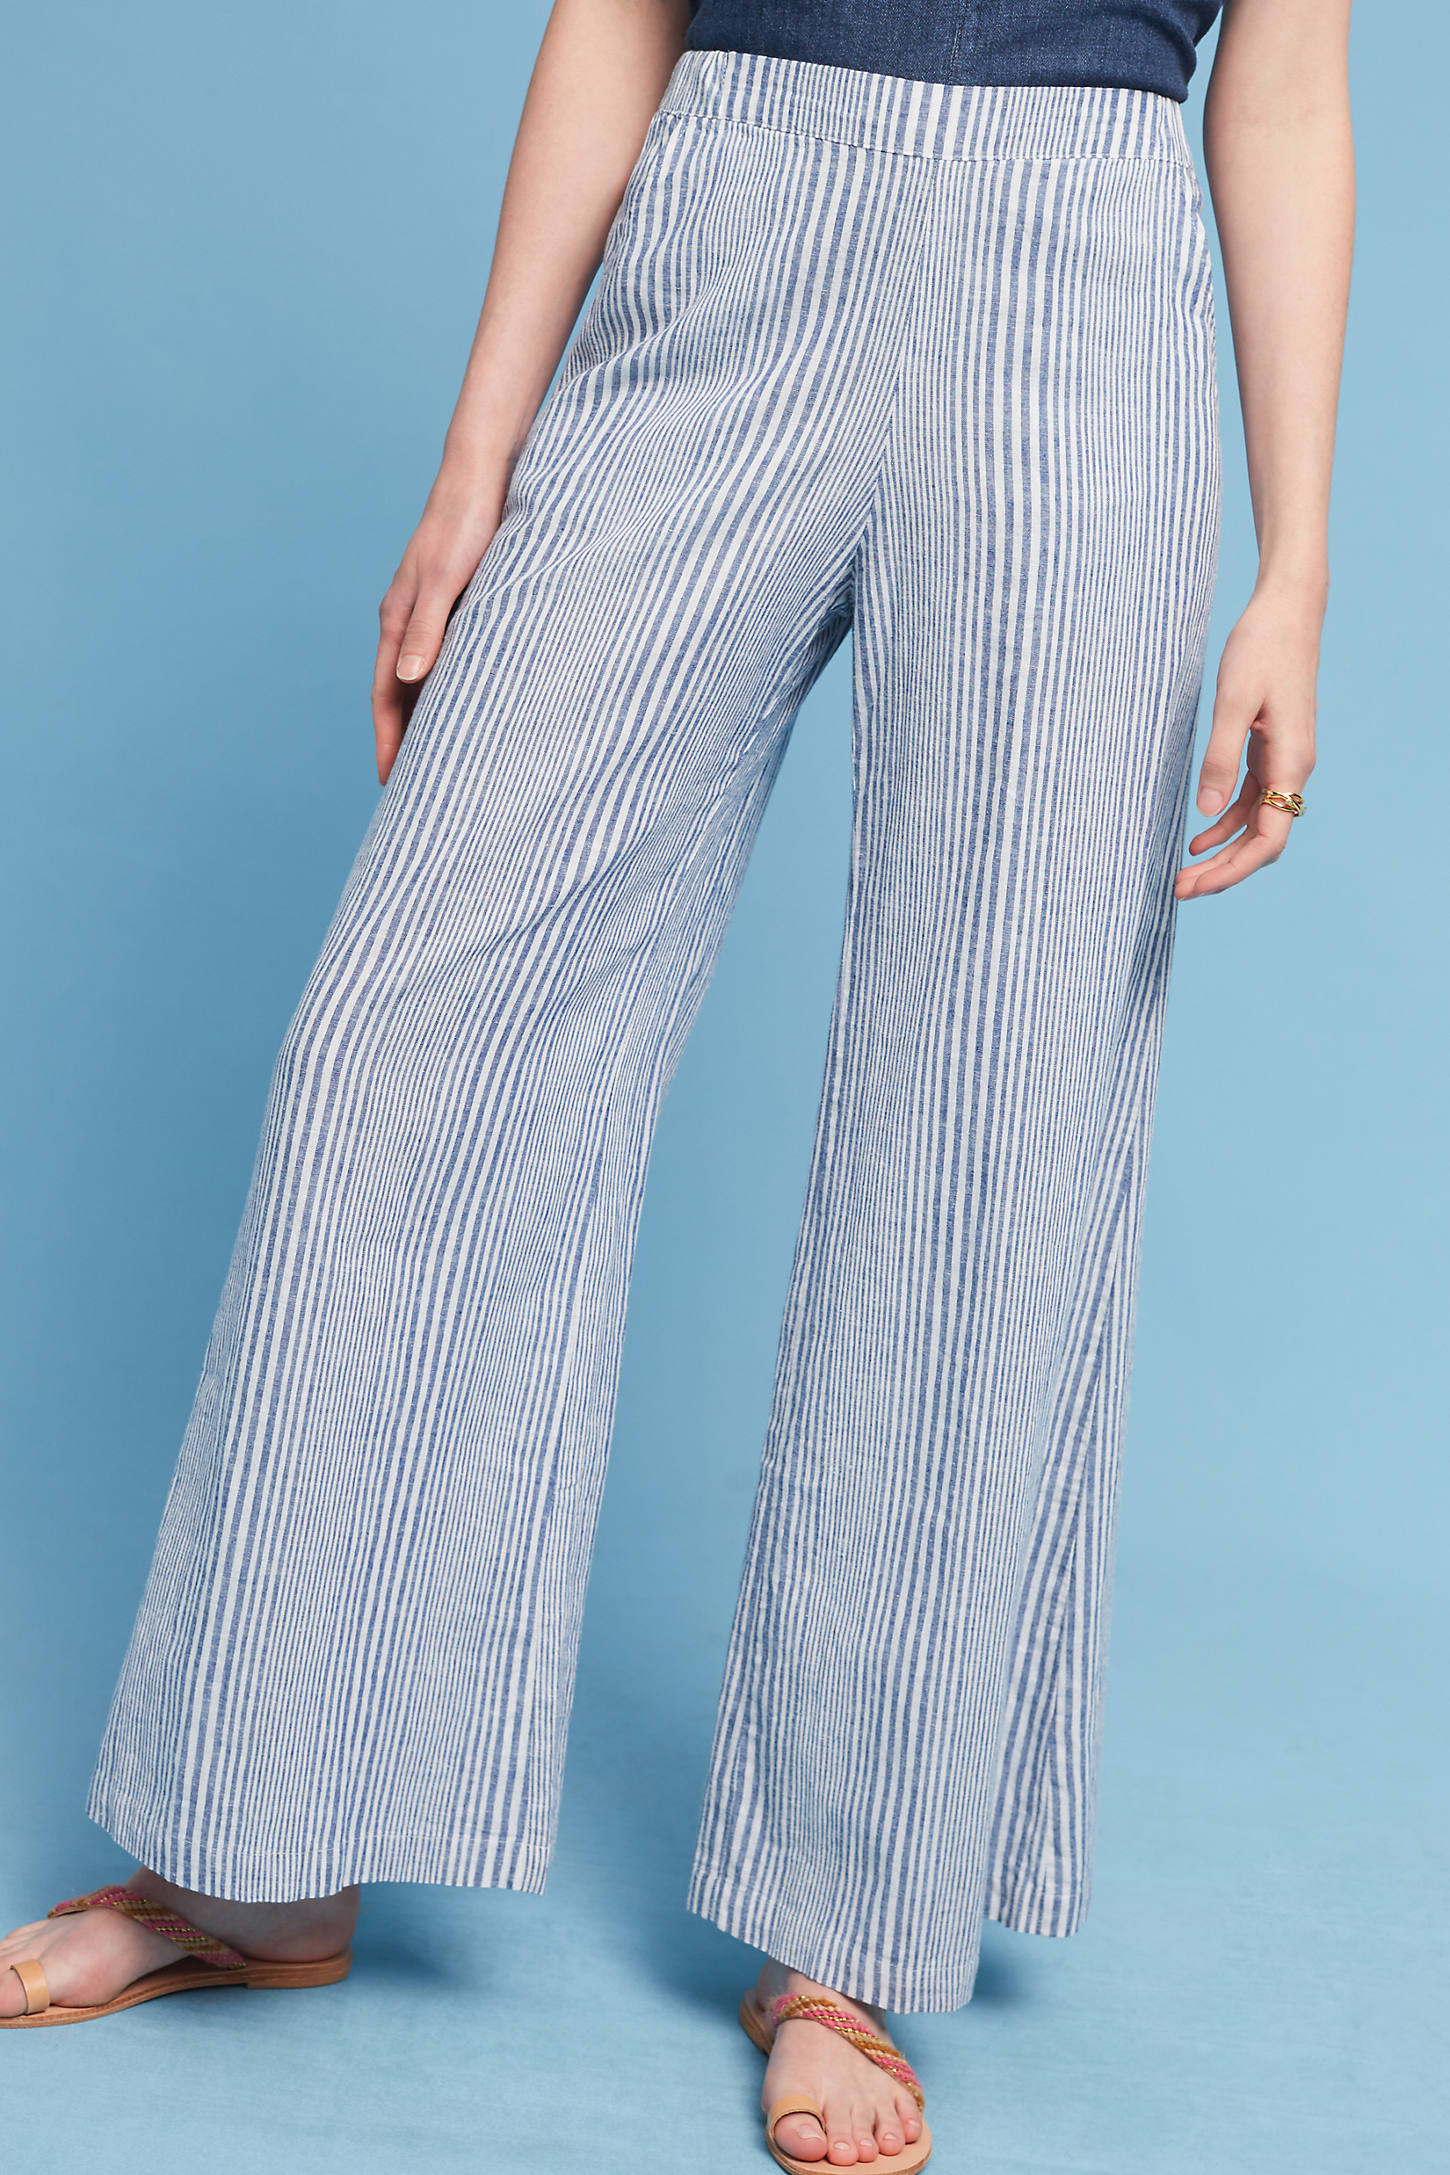 Pacifico Linen Wide-Legs